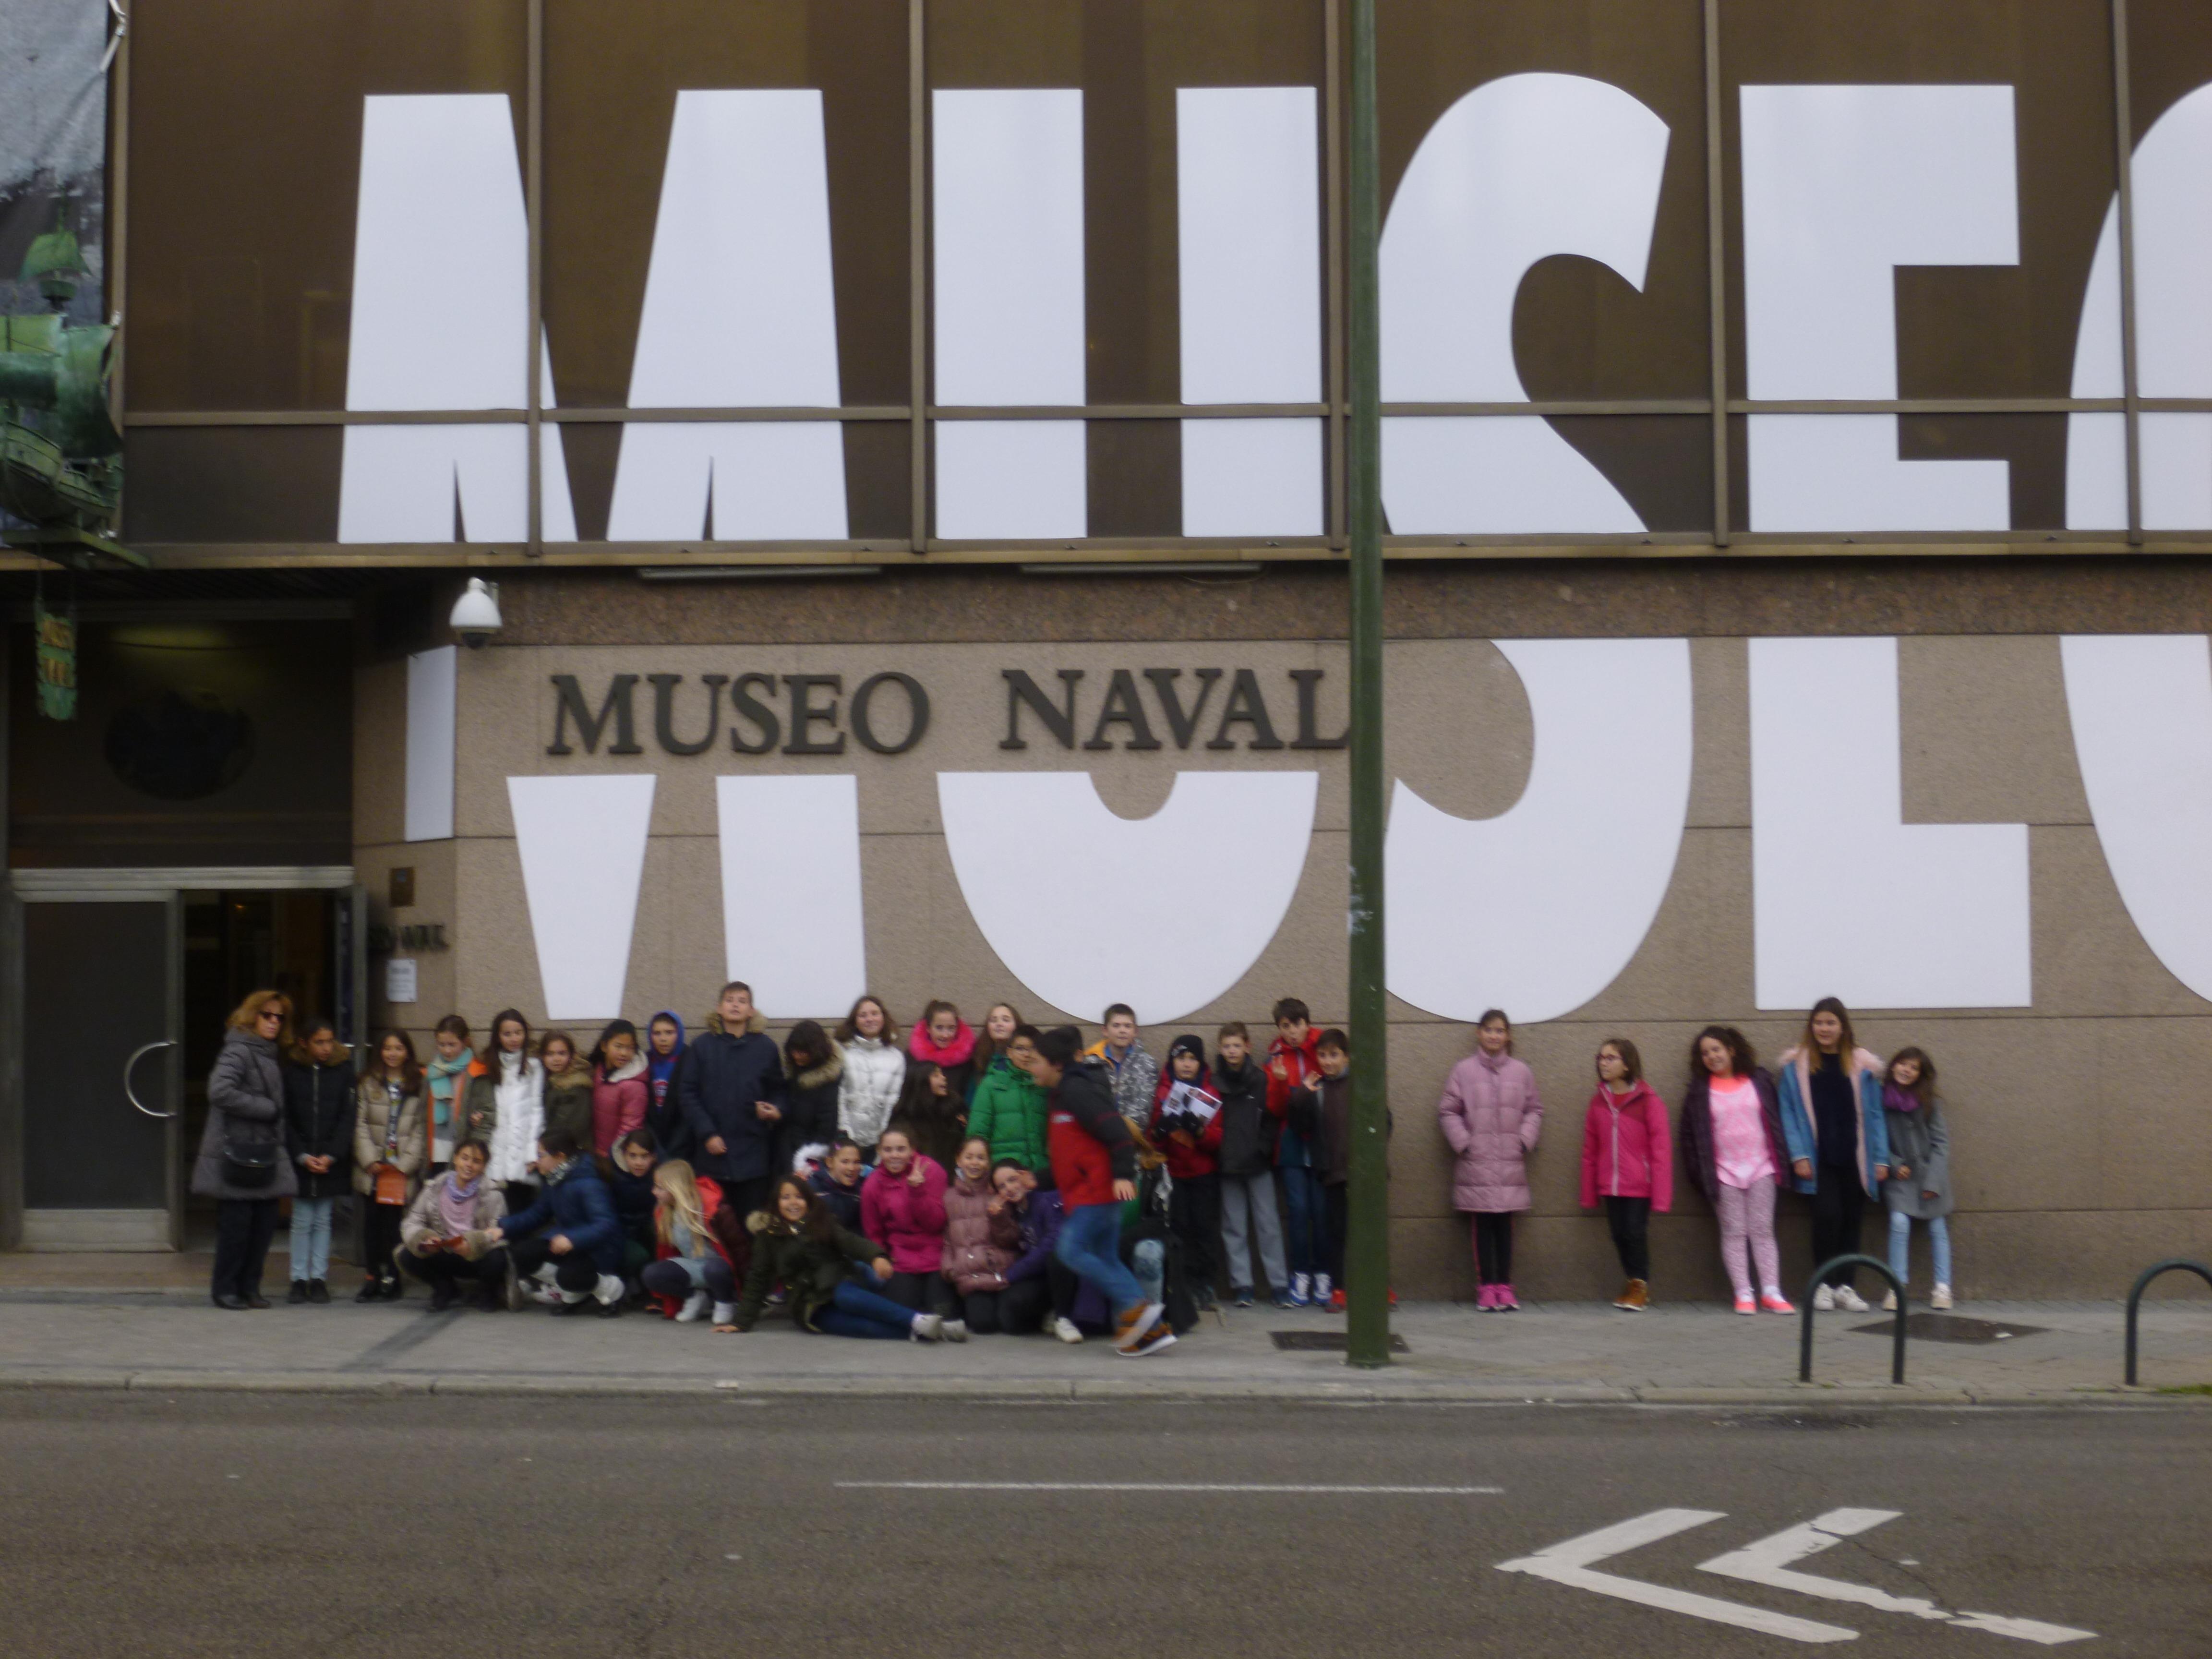 Visita por Madrid, Museo Naval 4